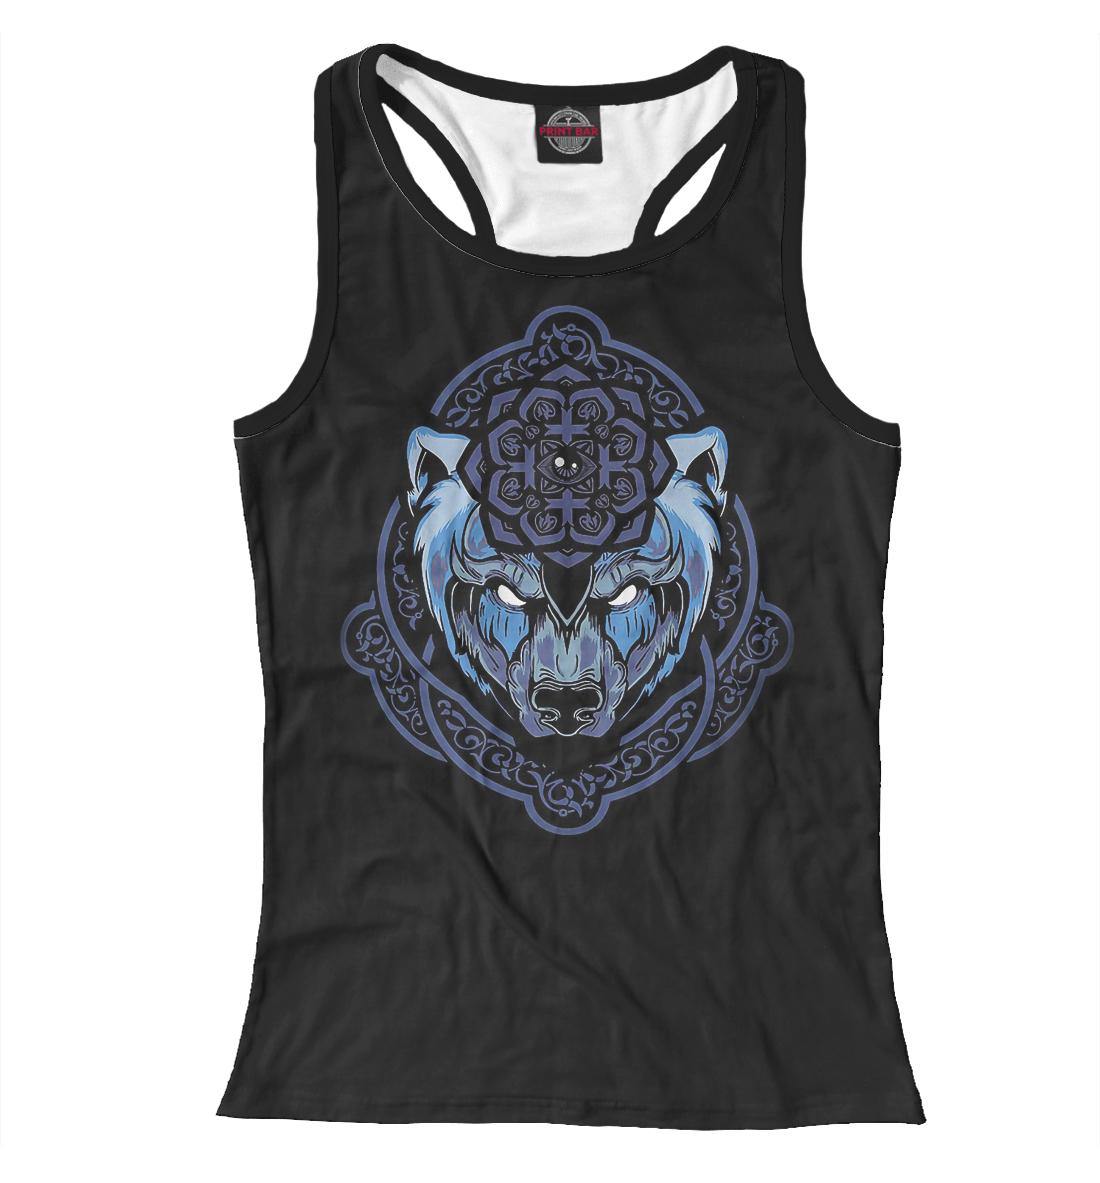 Купить Медведь, Printbar, Майки борцовки, CLT-239910-mayb-1